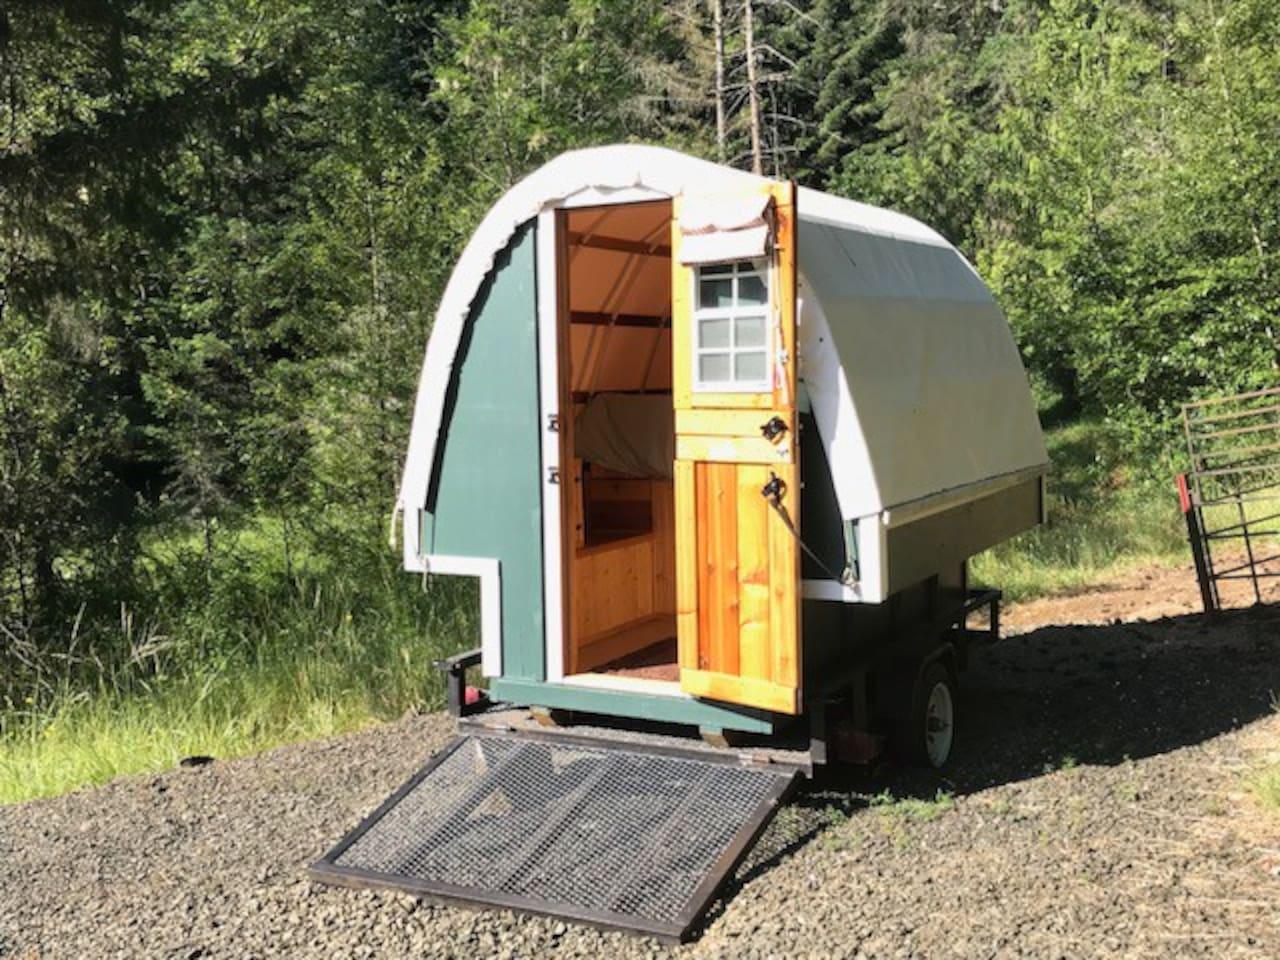 Sheepherder's Wagon Camper